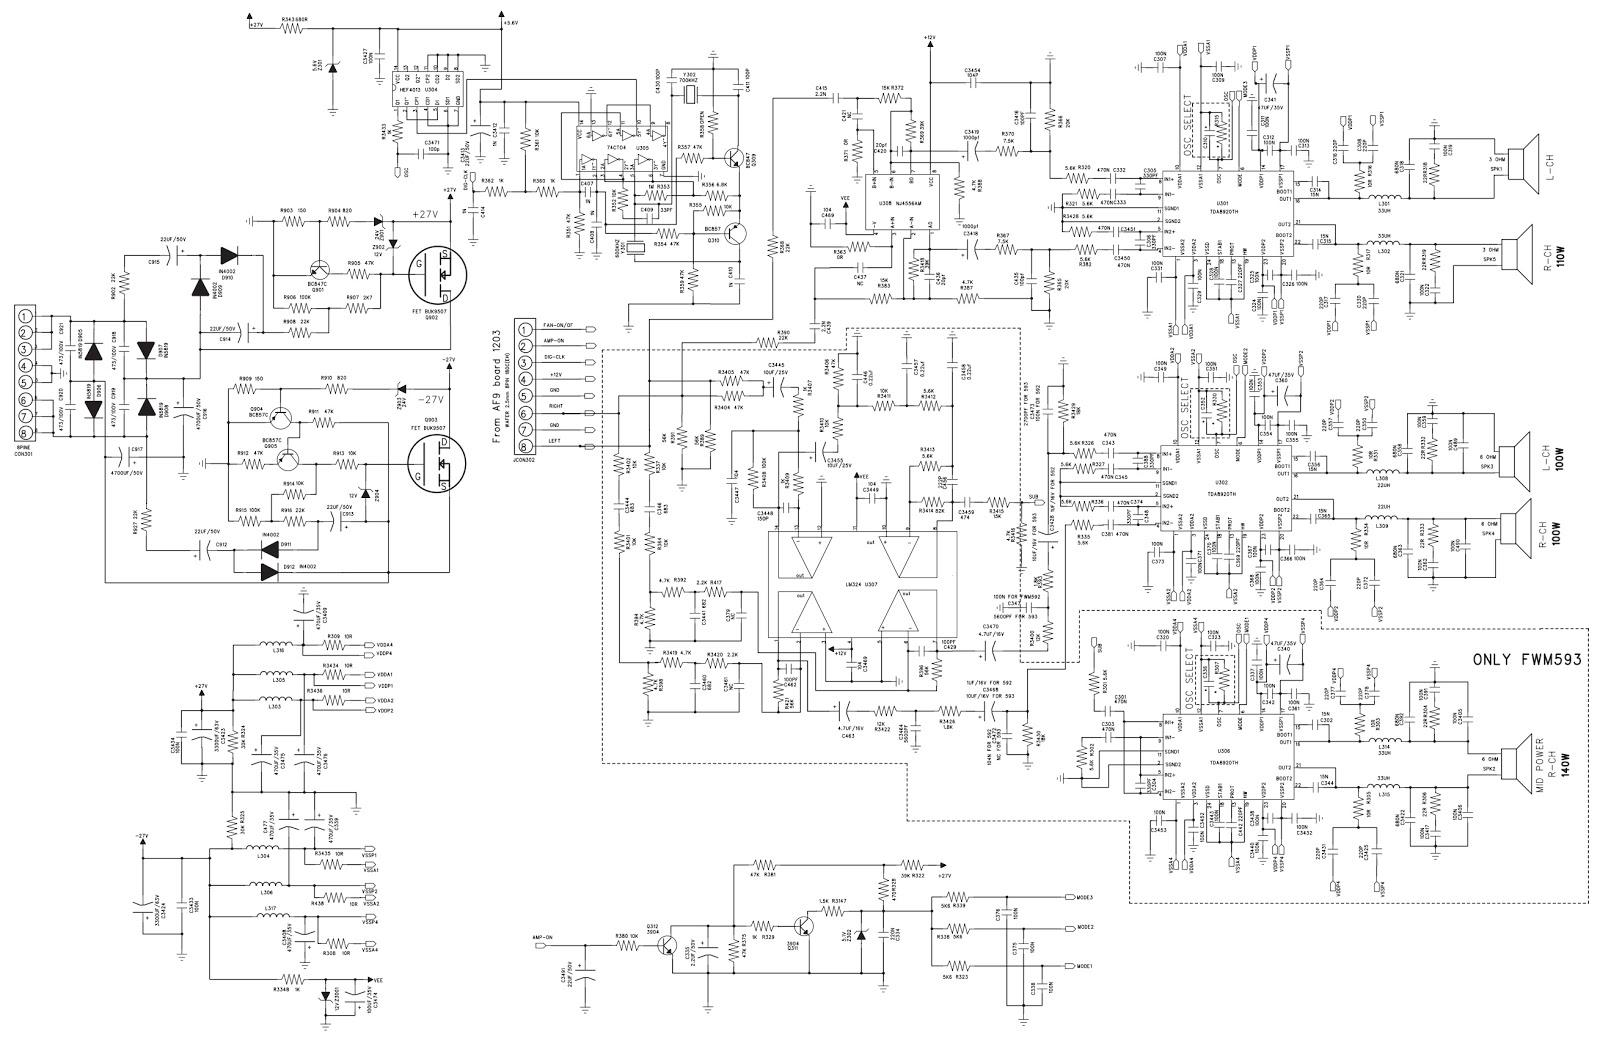 Electro Help Philips Fwm539 Mini Hi Fi System Power Amp